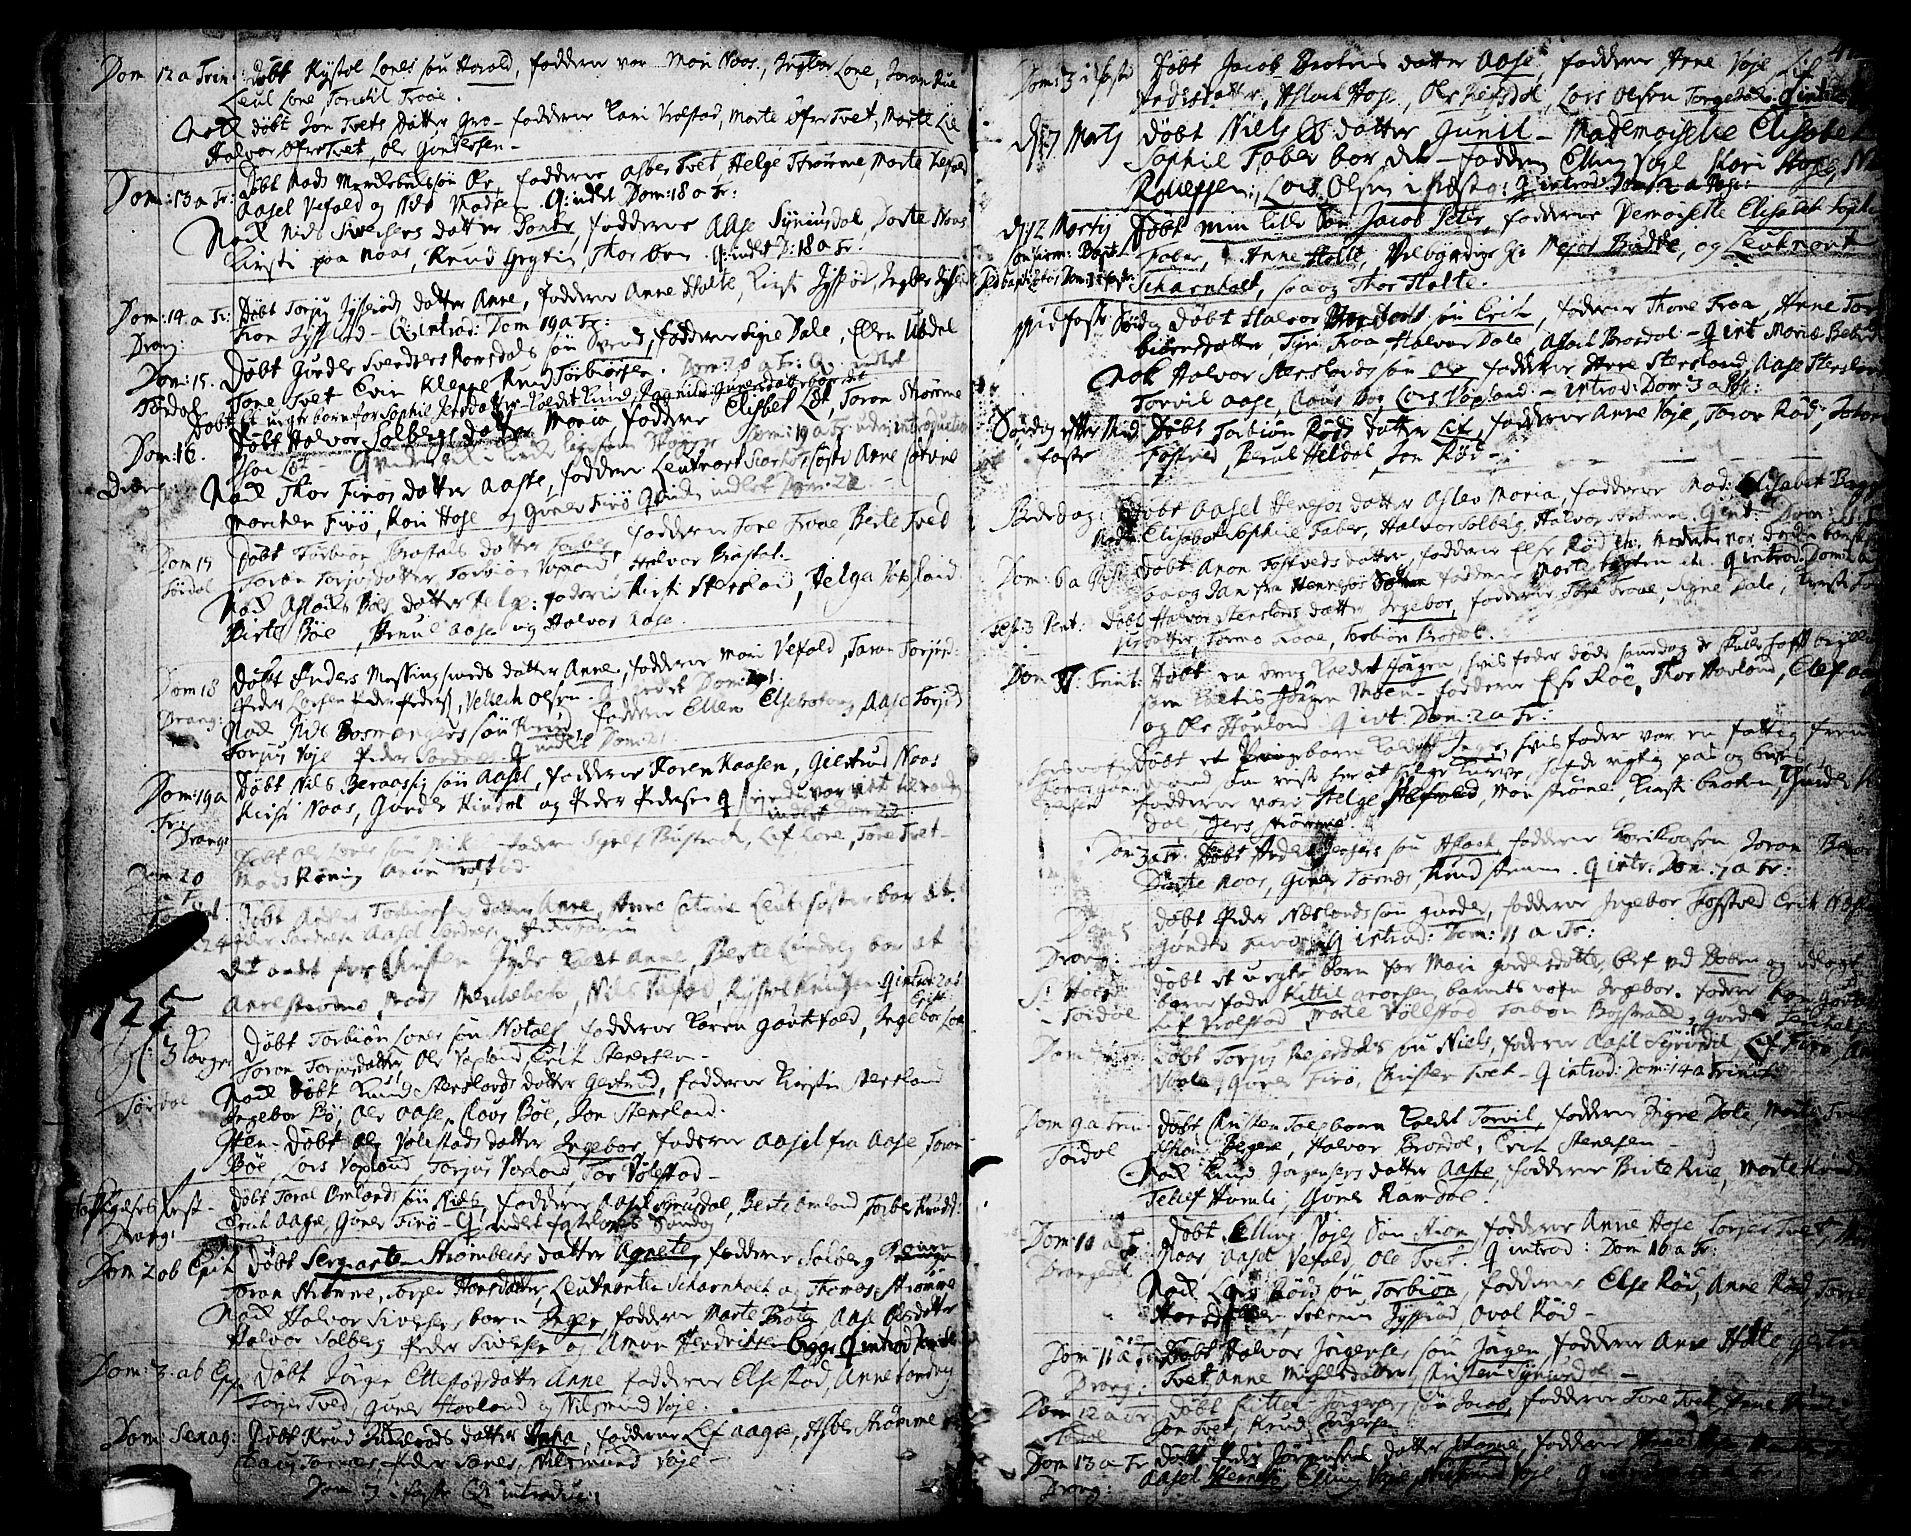 SAKO, Drangedal kirkebøker, F/Fa/L0001: Ministerialbok nr. 1, 1697-1767, s. 47